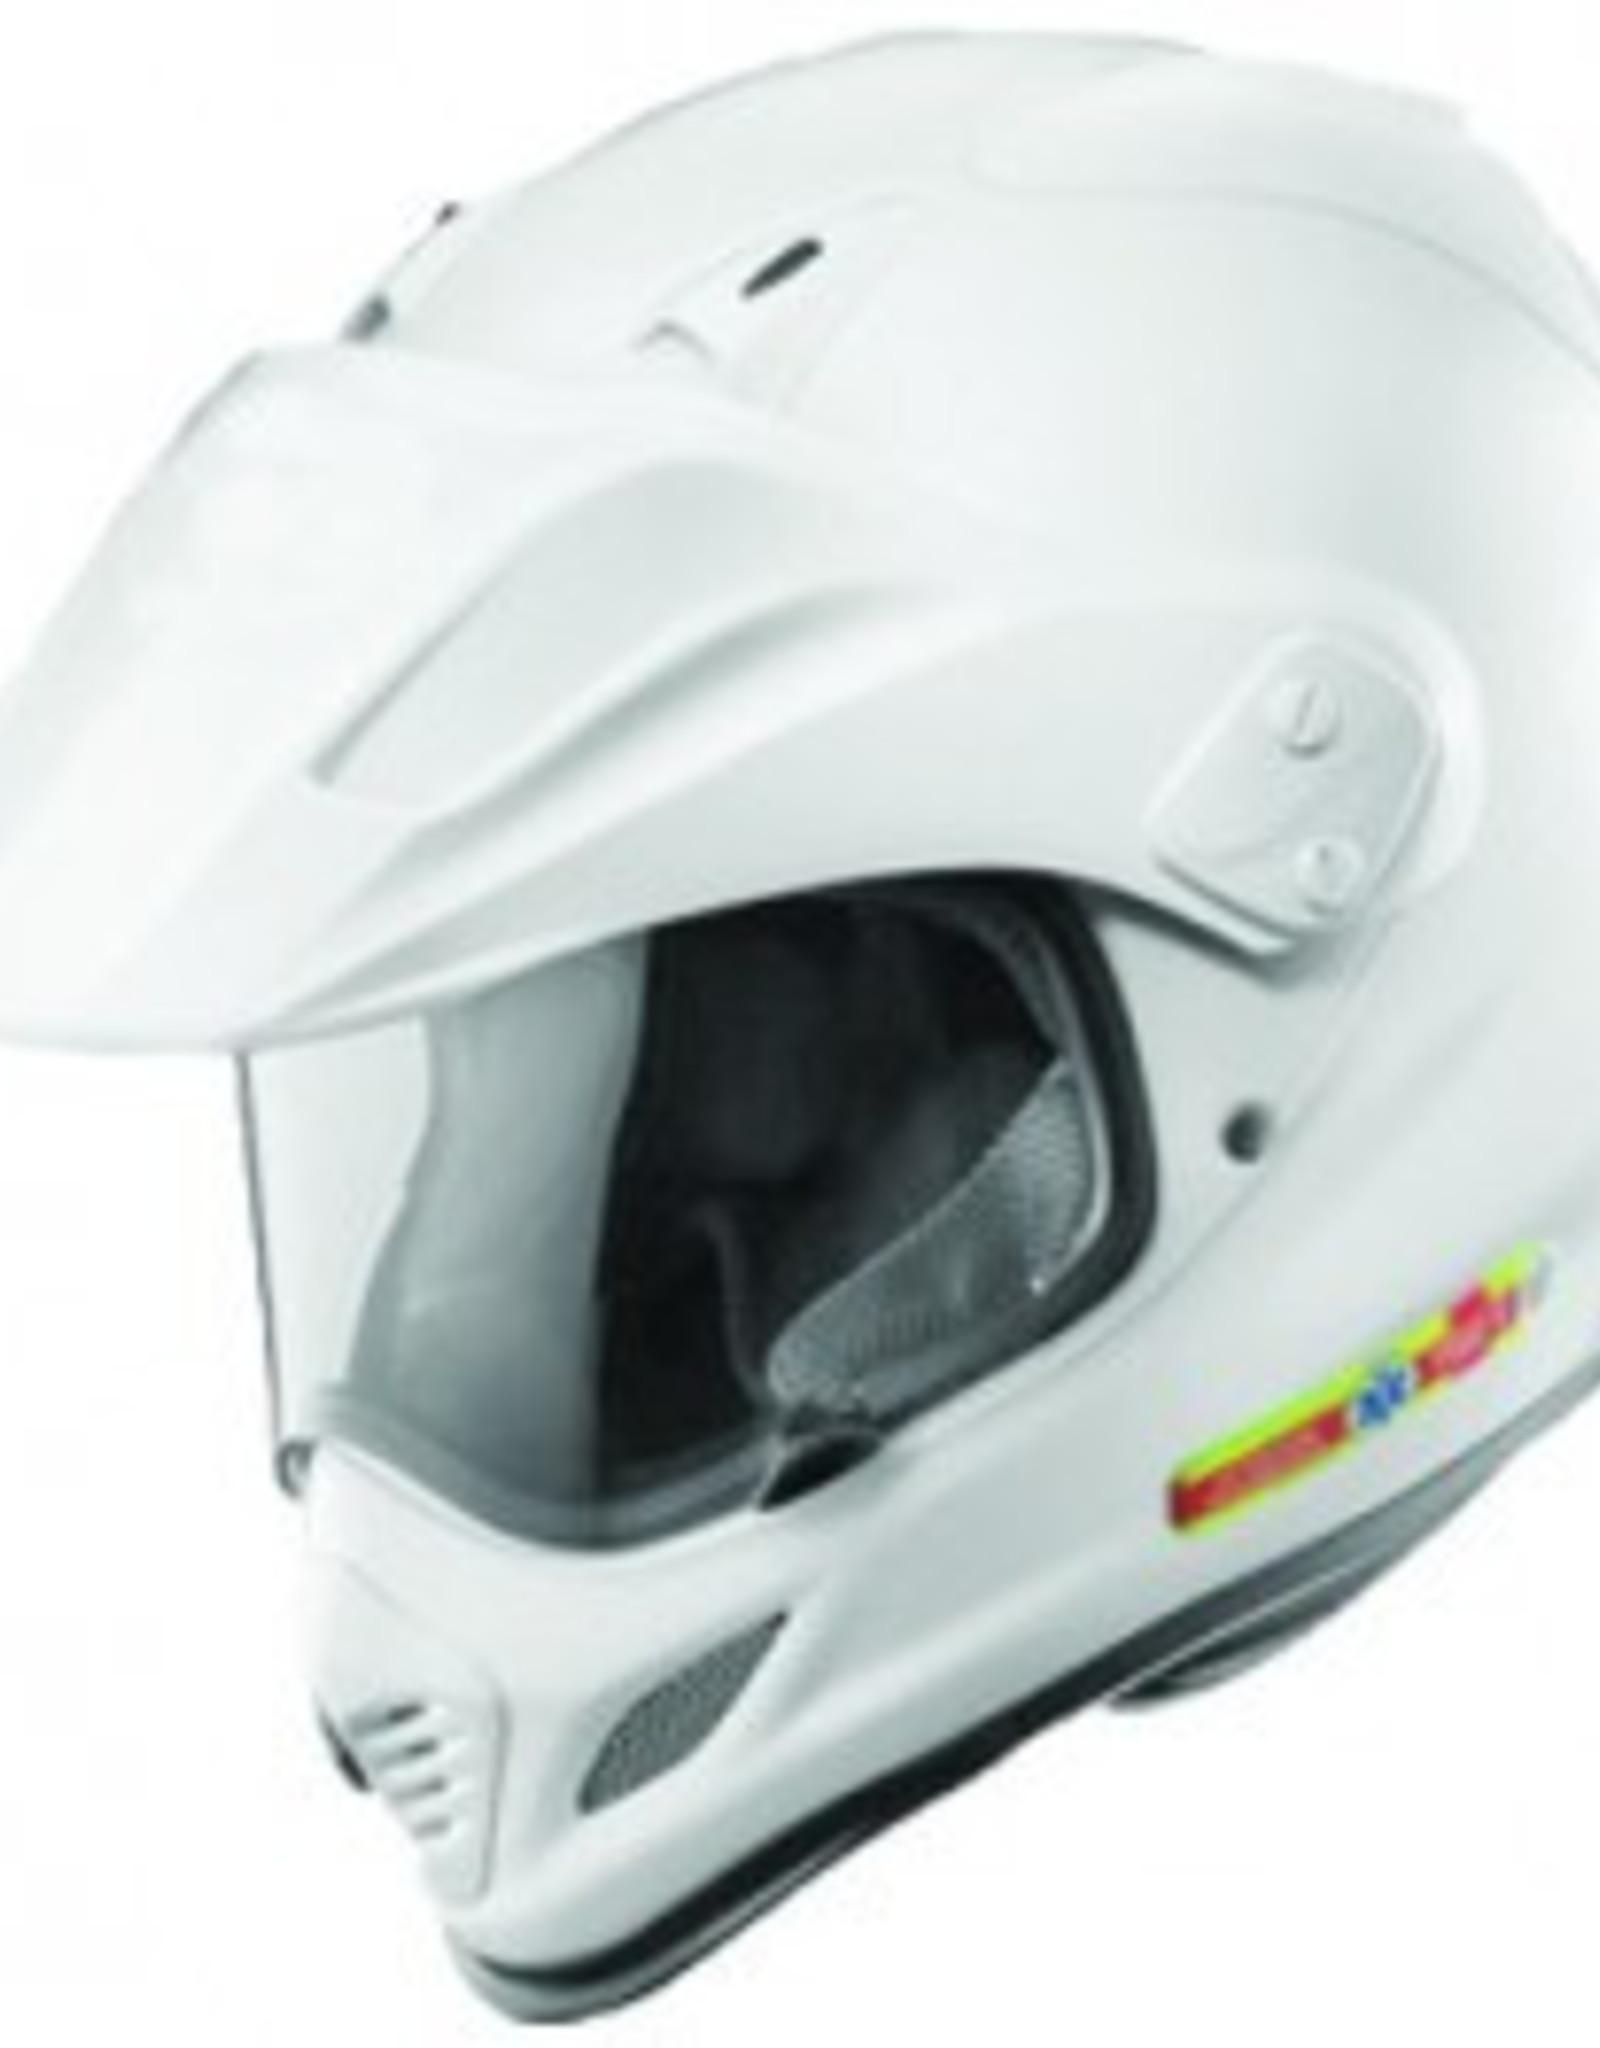 Identification for your helmet